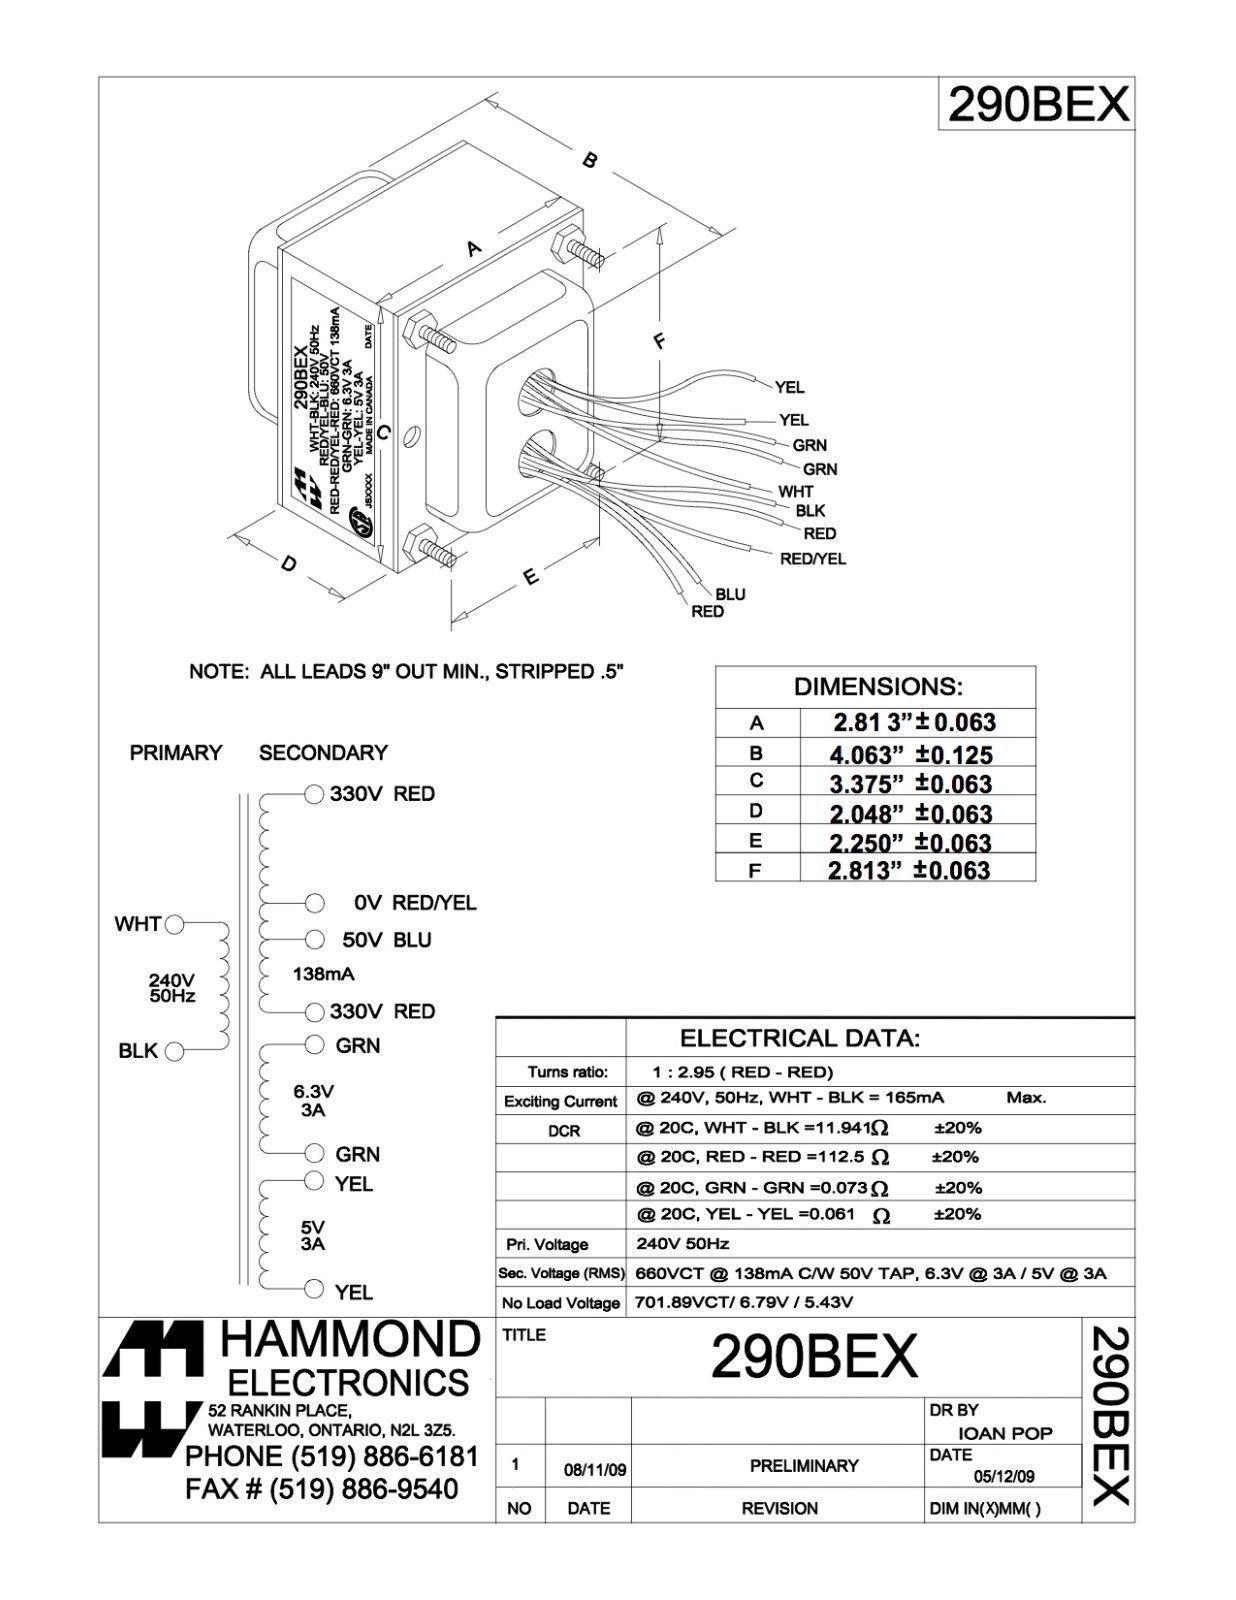 Hammond 290 Bex 240v Mains Power Transformer For Fender